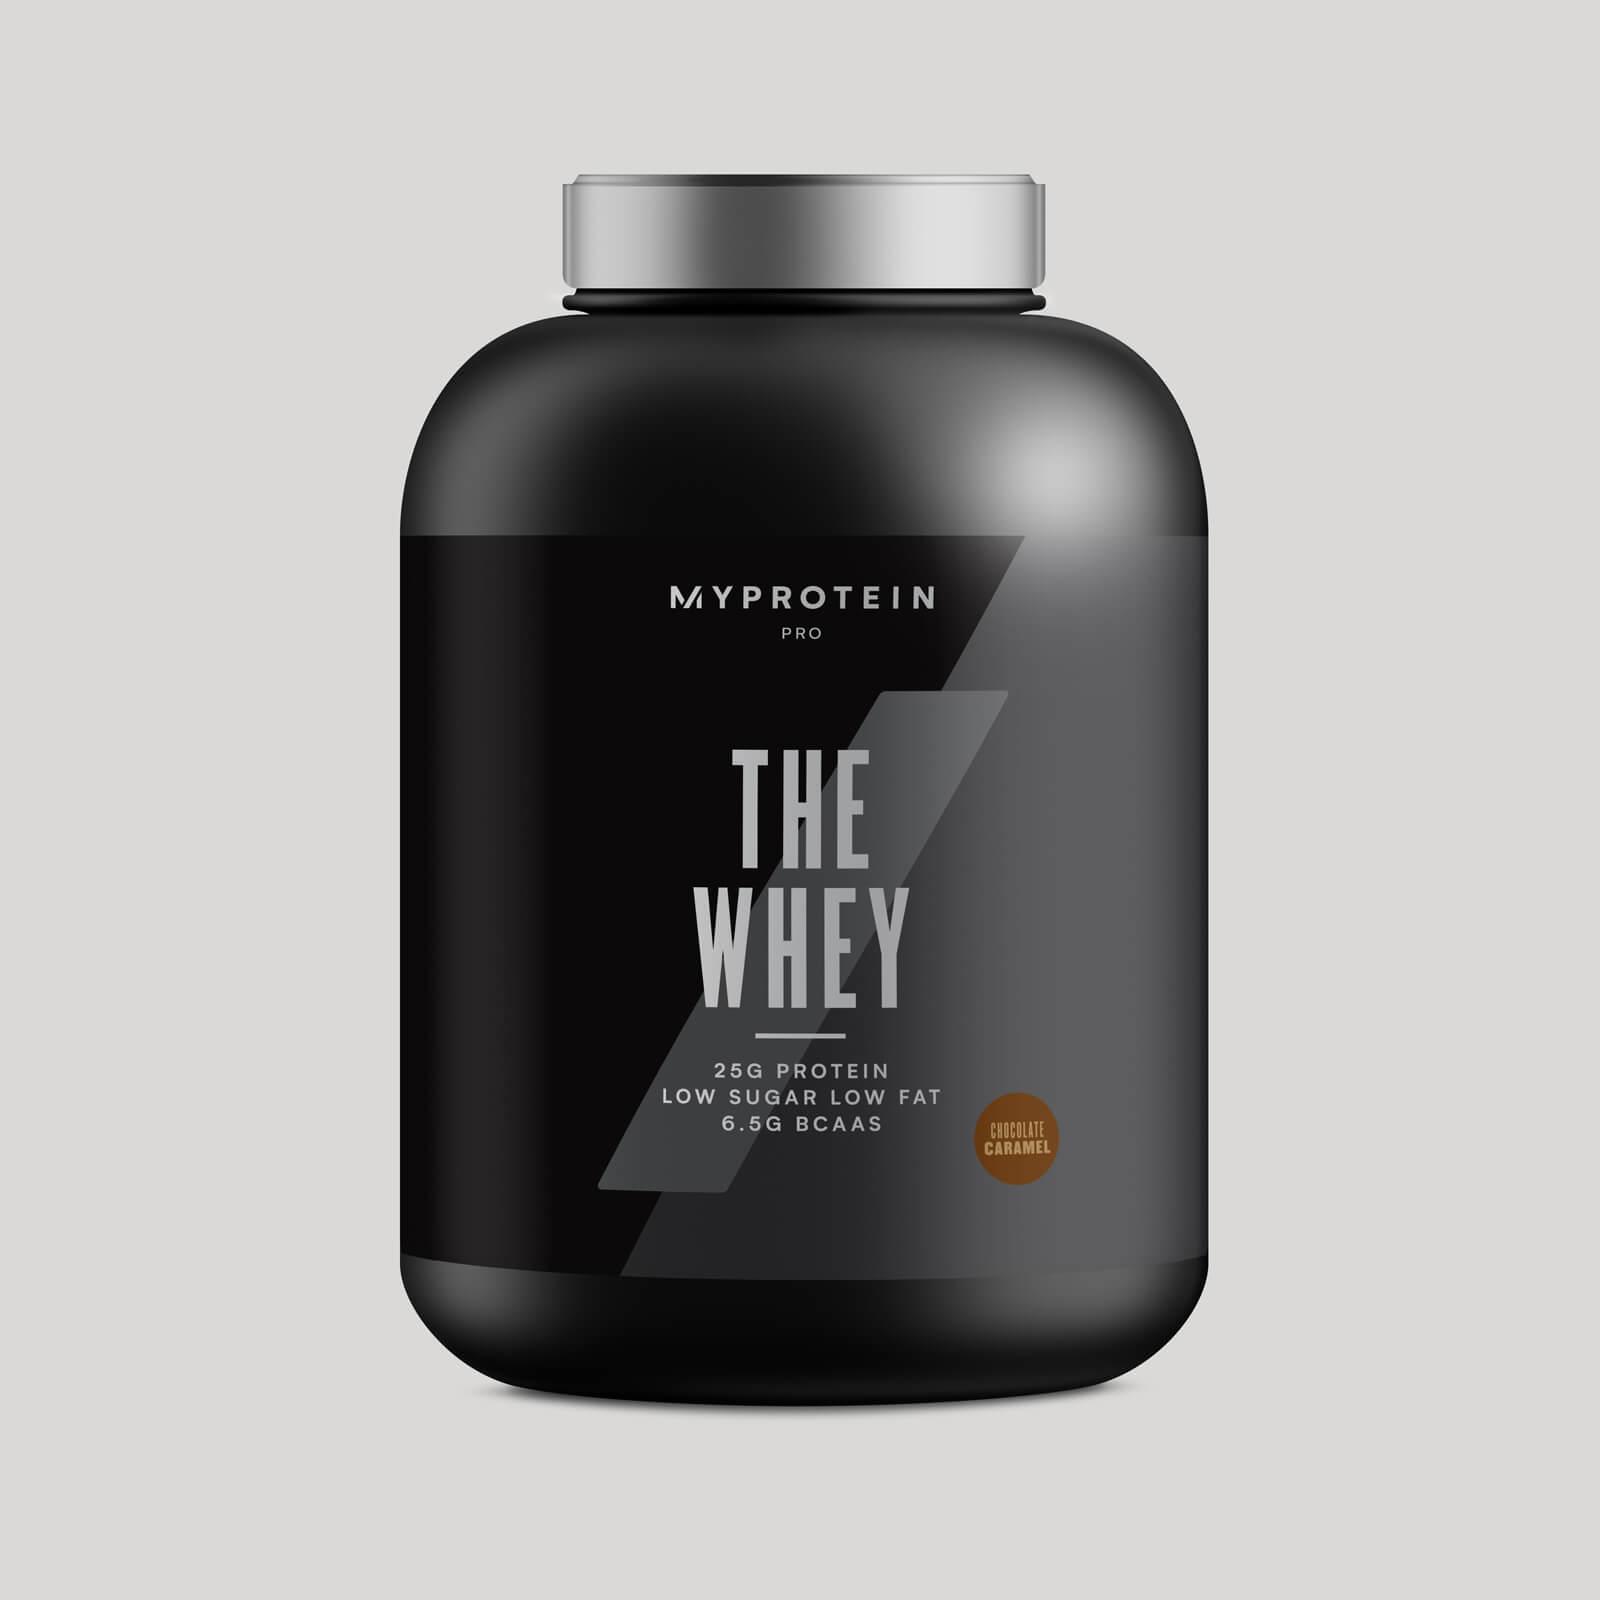 THE Whey™ - 60 Servings - 1.8kg - Chocolat Caramel